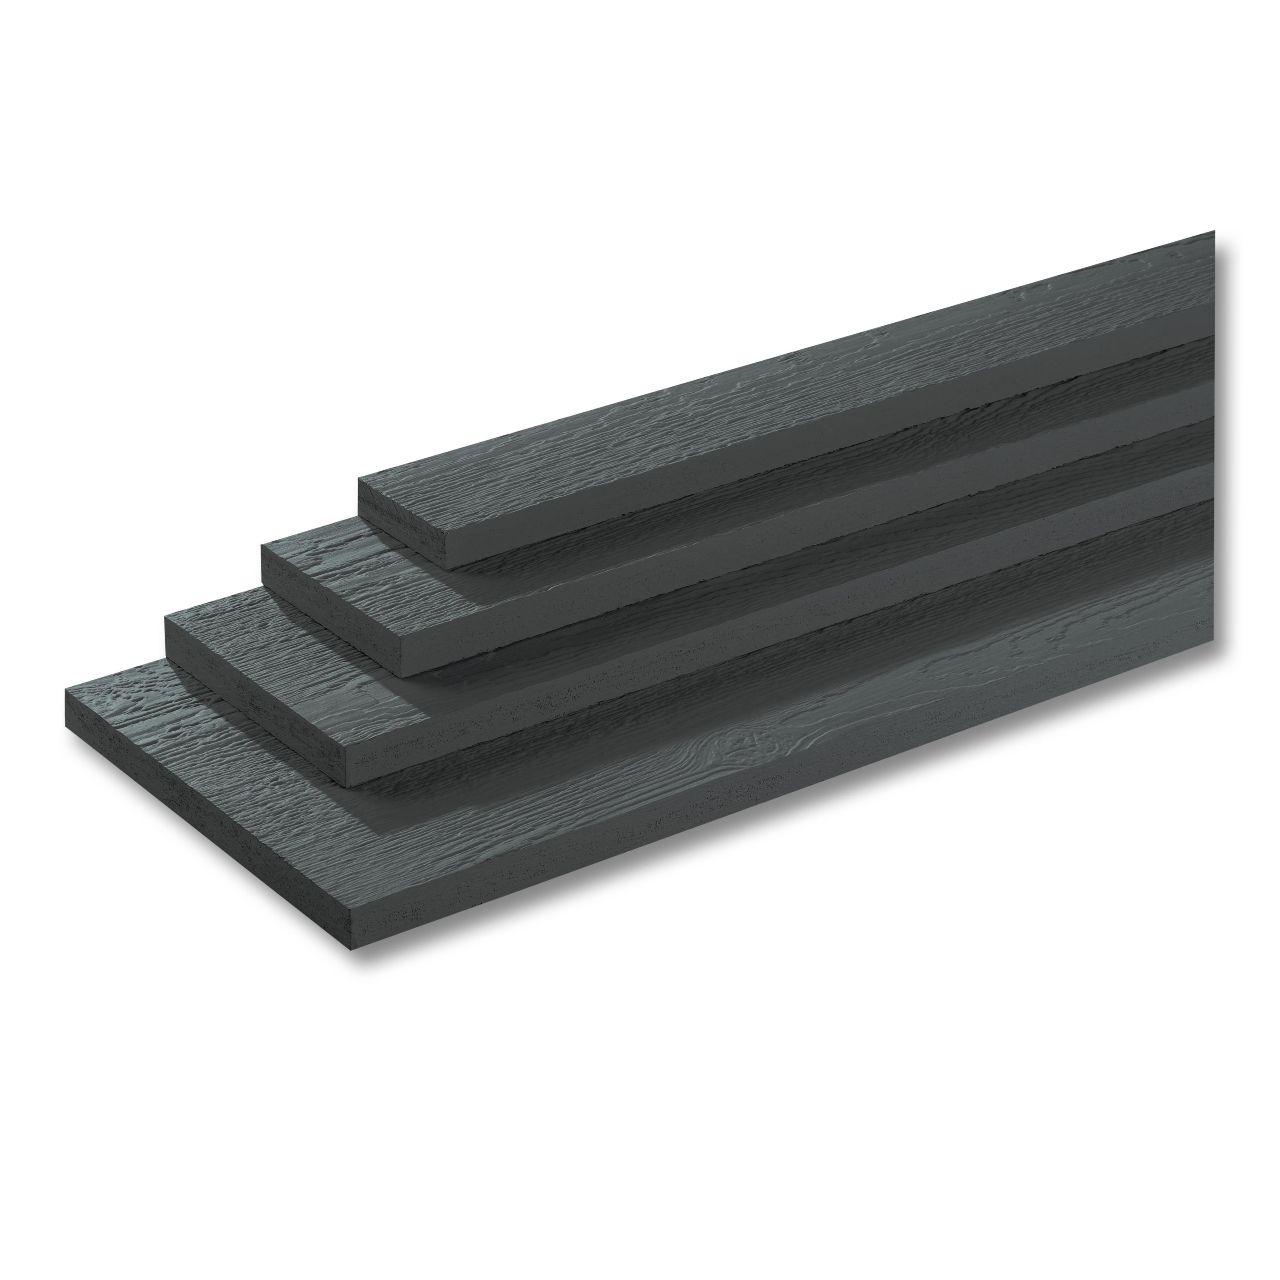 "LP SmartSide ExpertFinish 19/32"" 2-1/2"" x 16' 190 Series Cedar Texture Trim Engineered Wood Siding Sand Dunes"